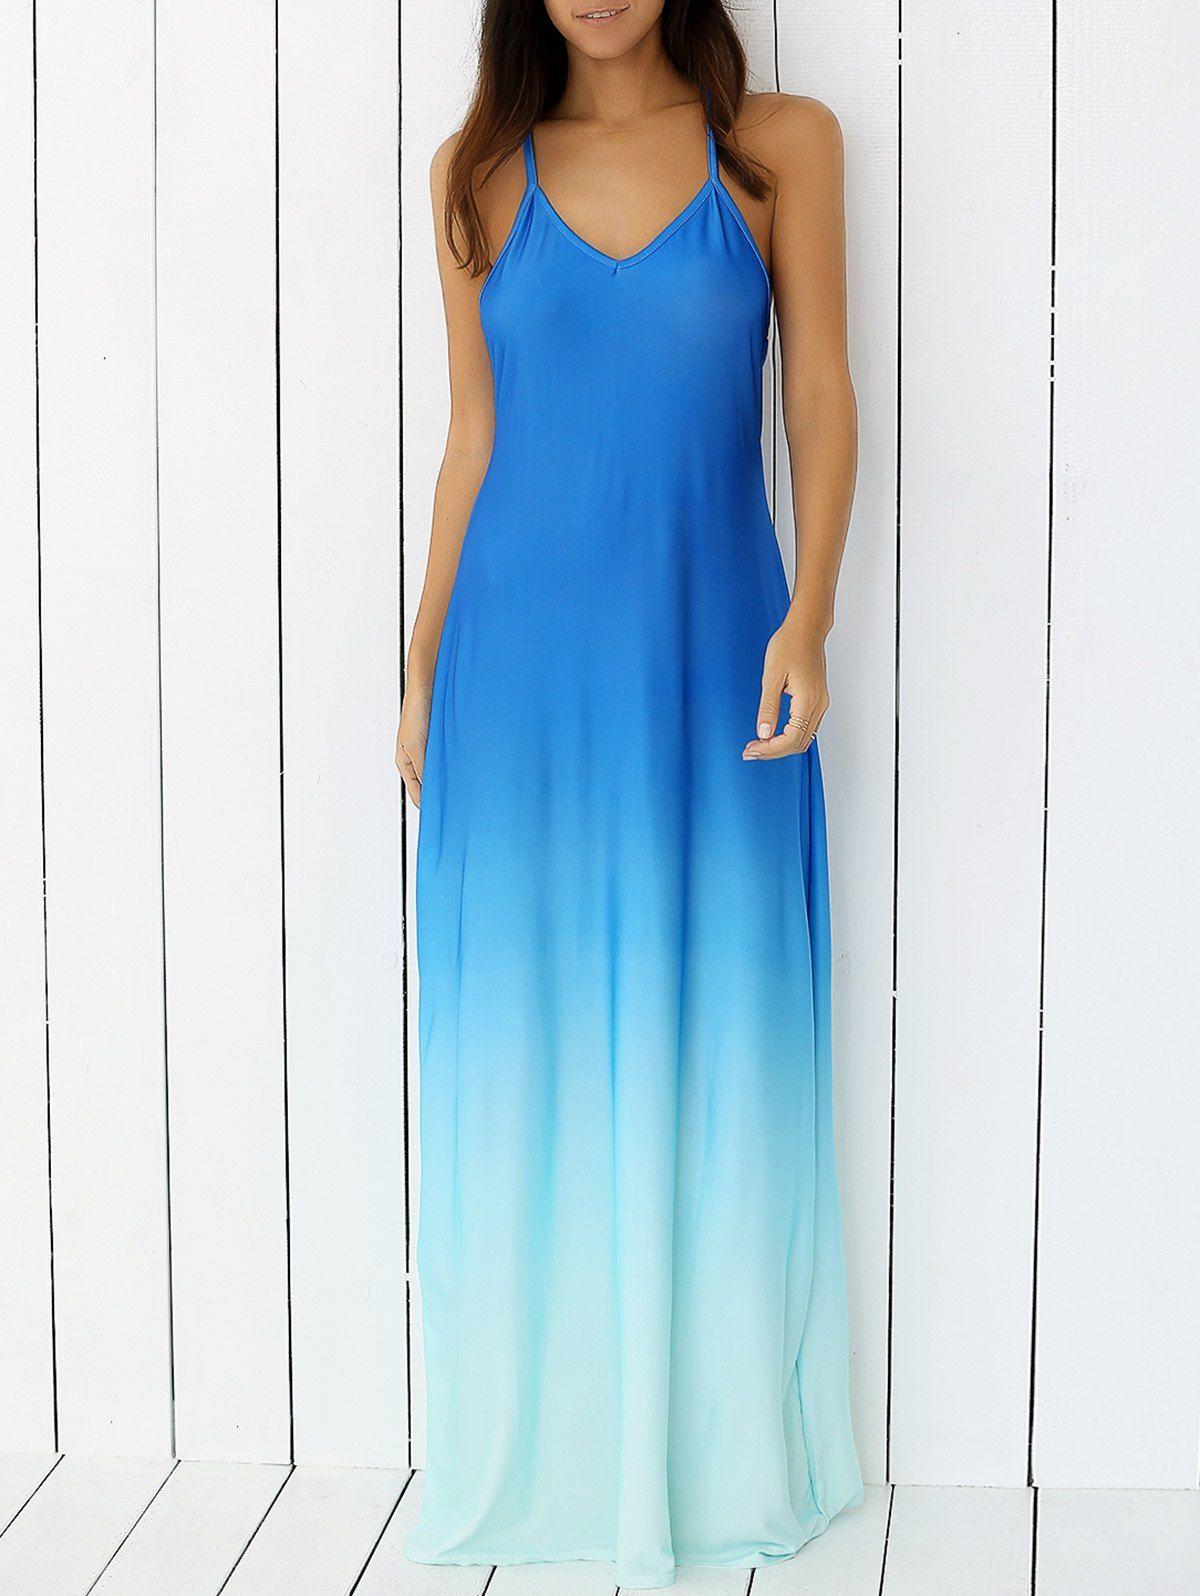 Bohemian Criss-Cross Backless Tie-Dye Cami Dress | Bohemian, Blue ...